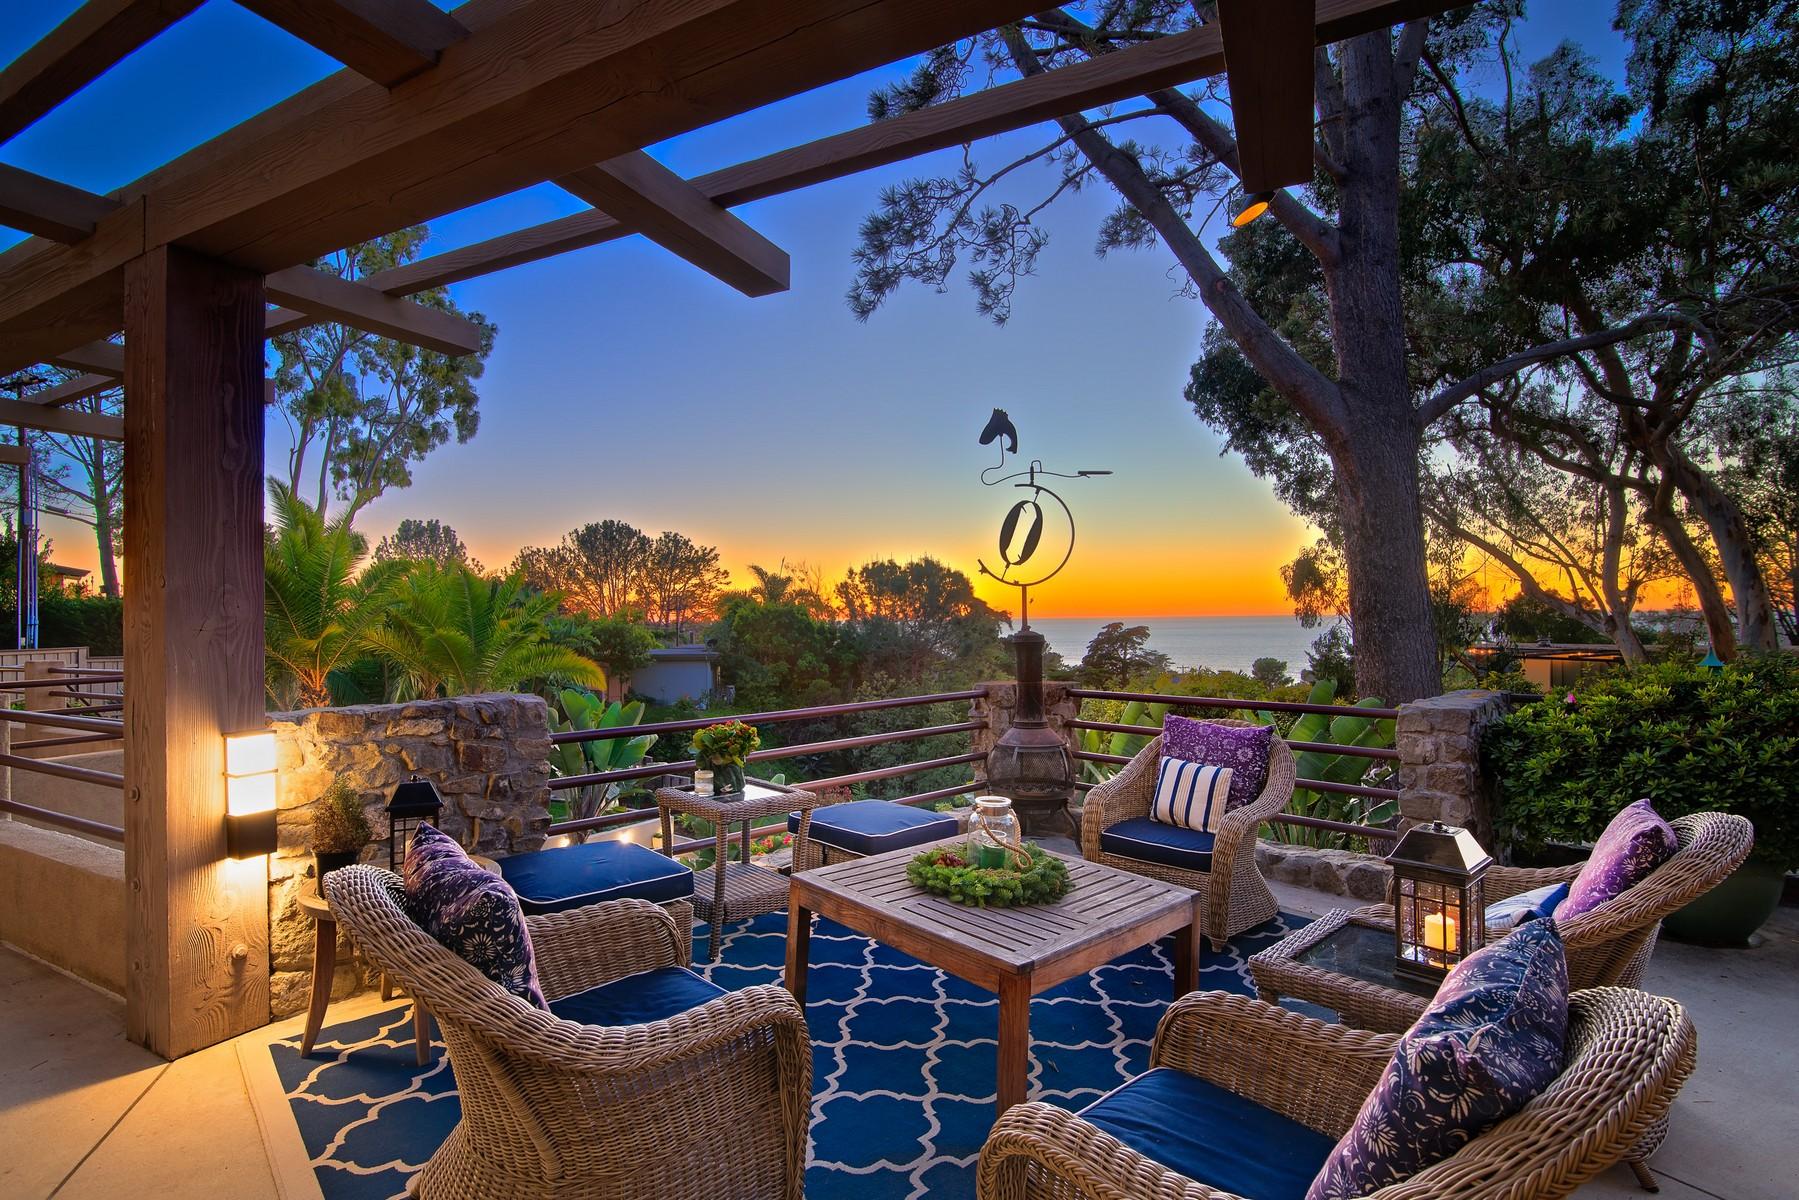 Single Family Home for Sale at 645 Amphitheatre Drive Del Mar, California 92014 United States